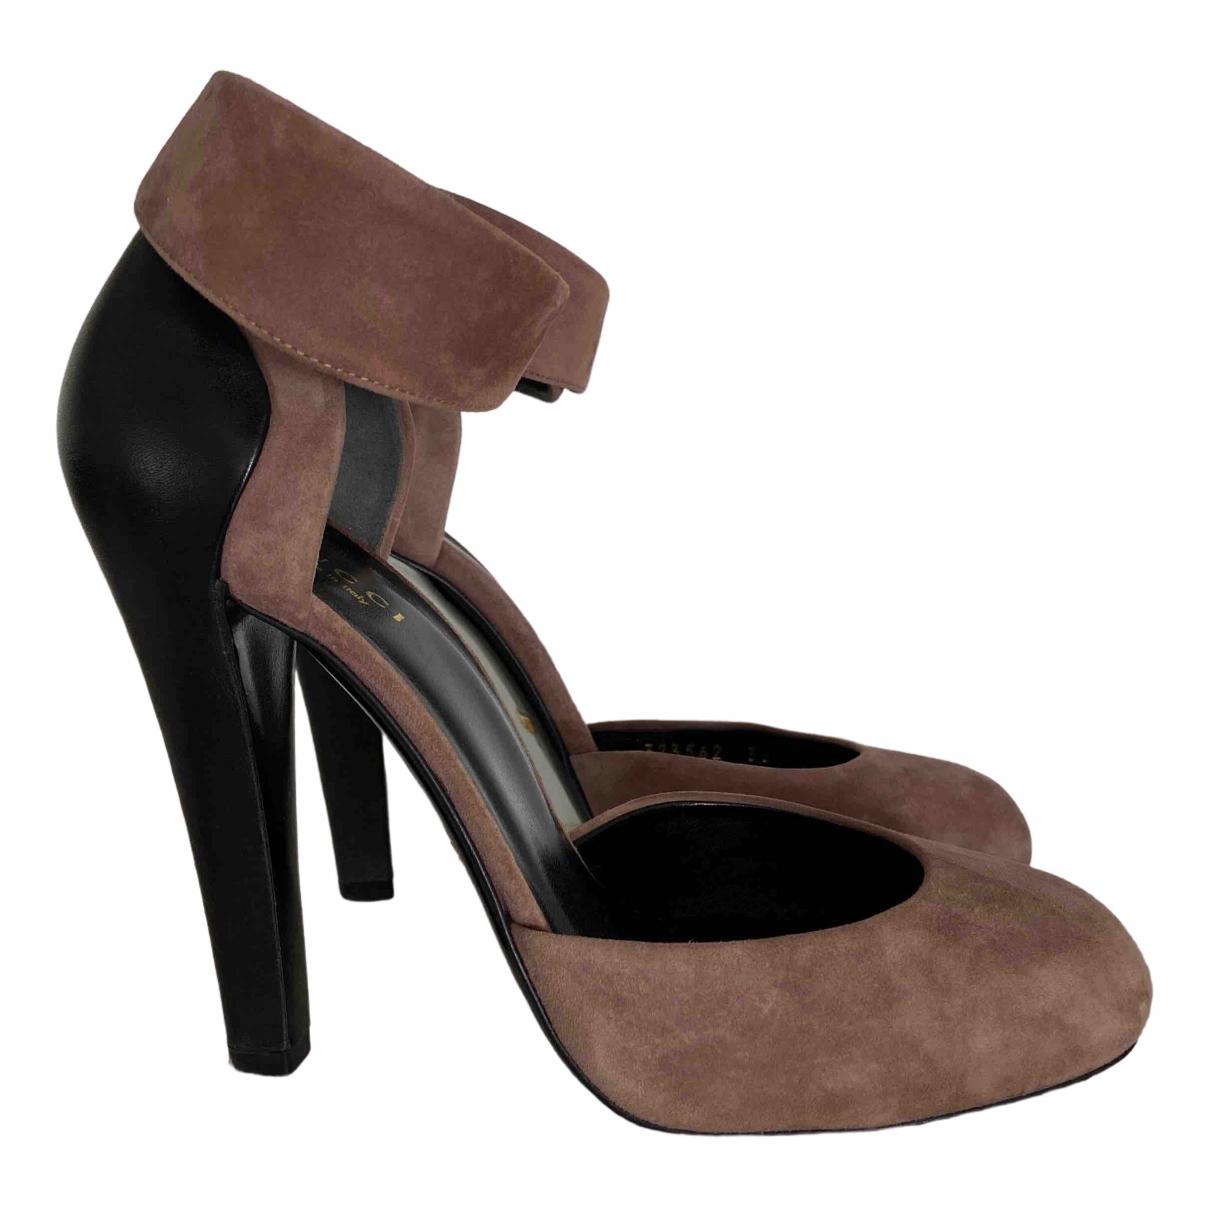 Gucci \N Pink Suede Heels for Women 36.5 EU